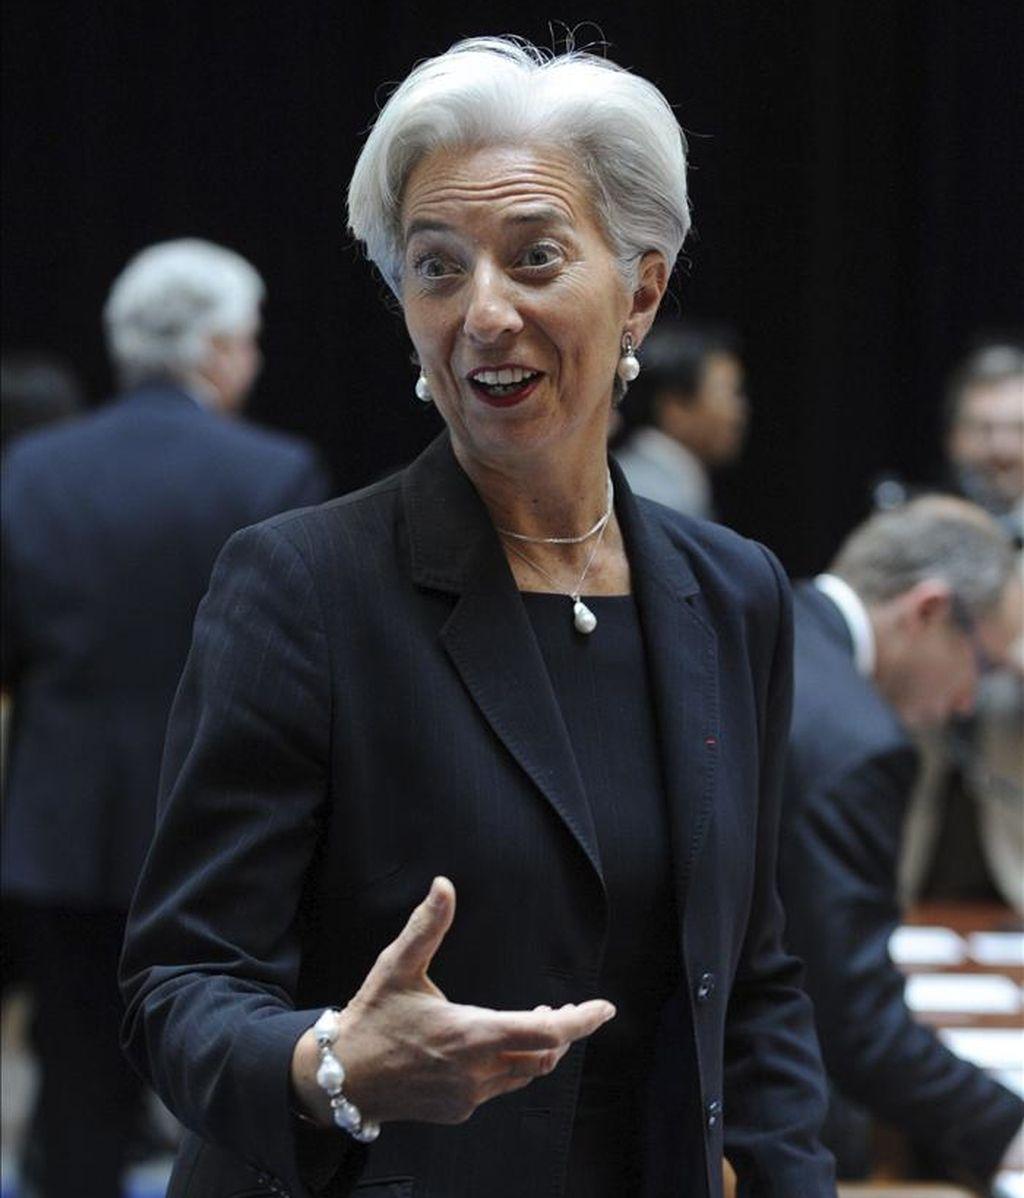 La ministra francesa de Finanzas, Christine Lagarde. EFE/Archivo